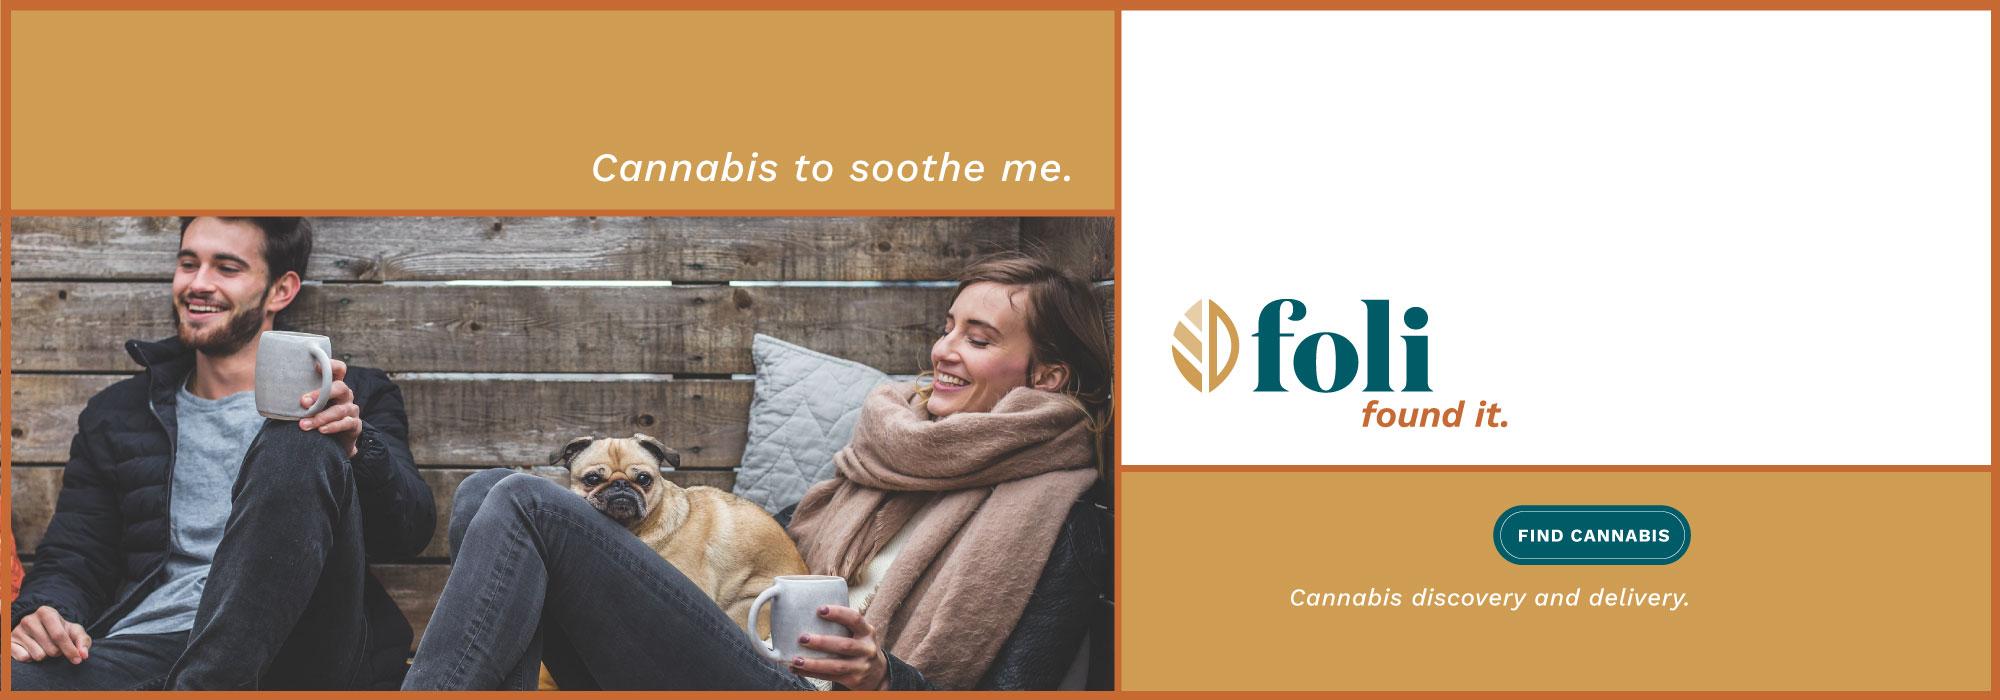 My Foli cannabis directory advertising